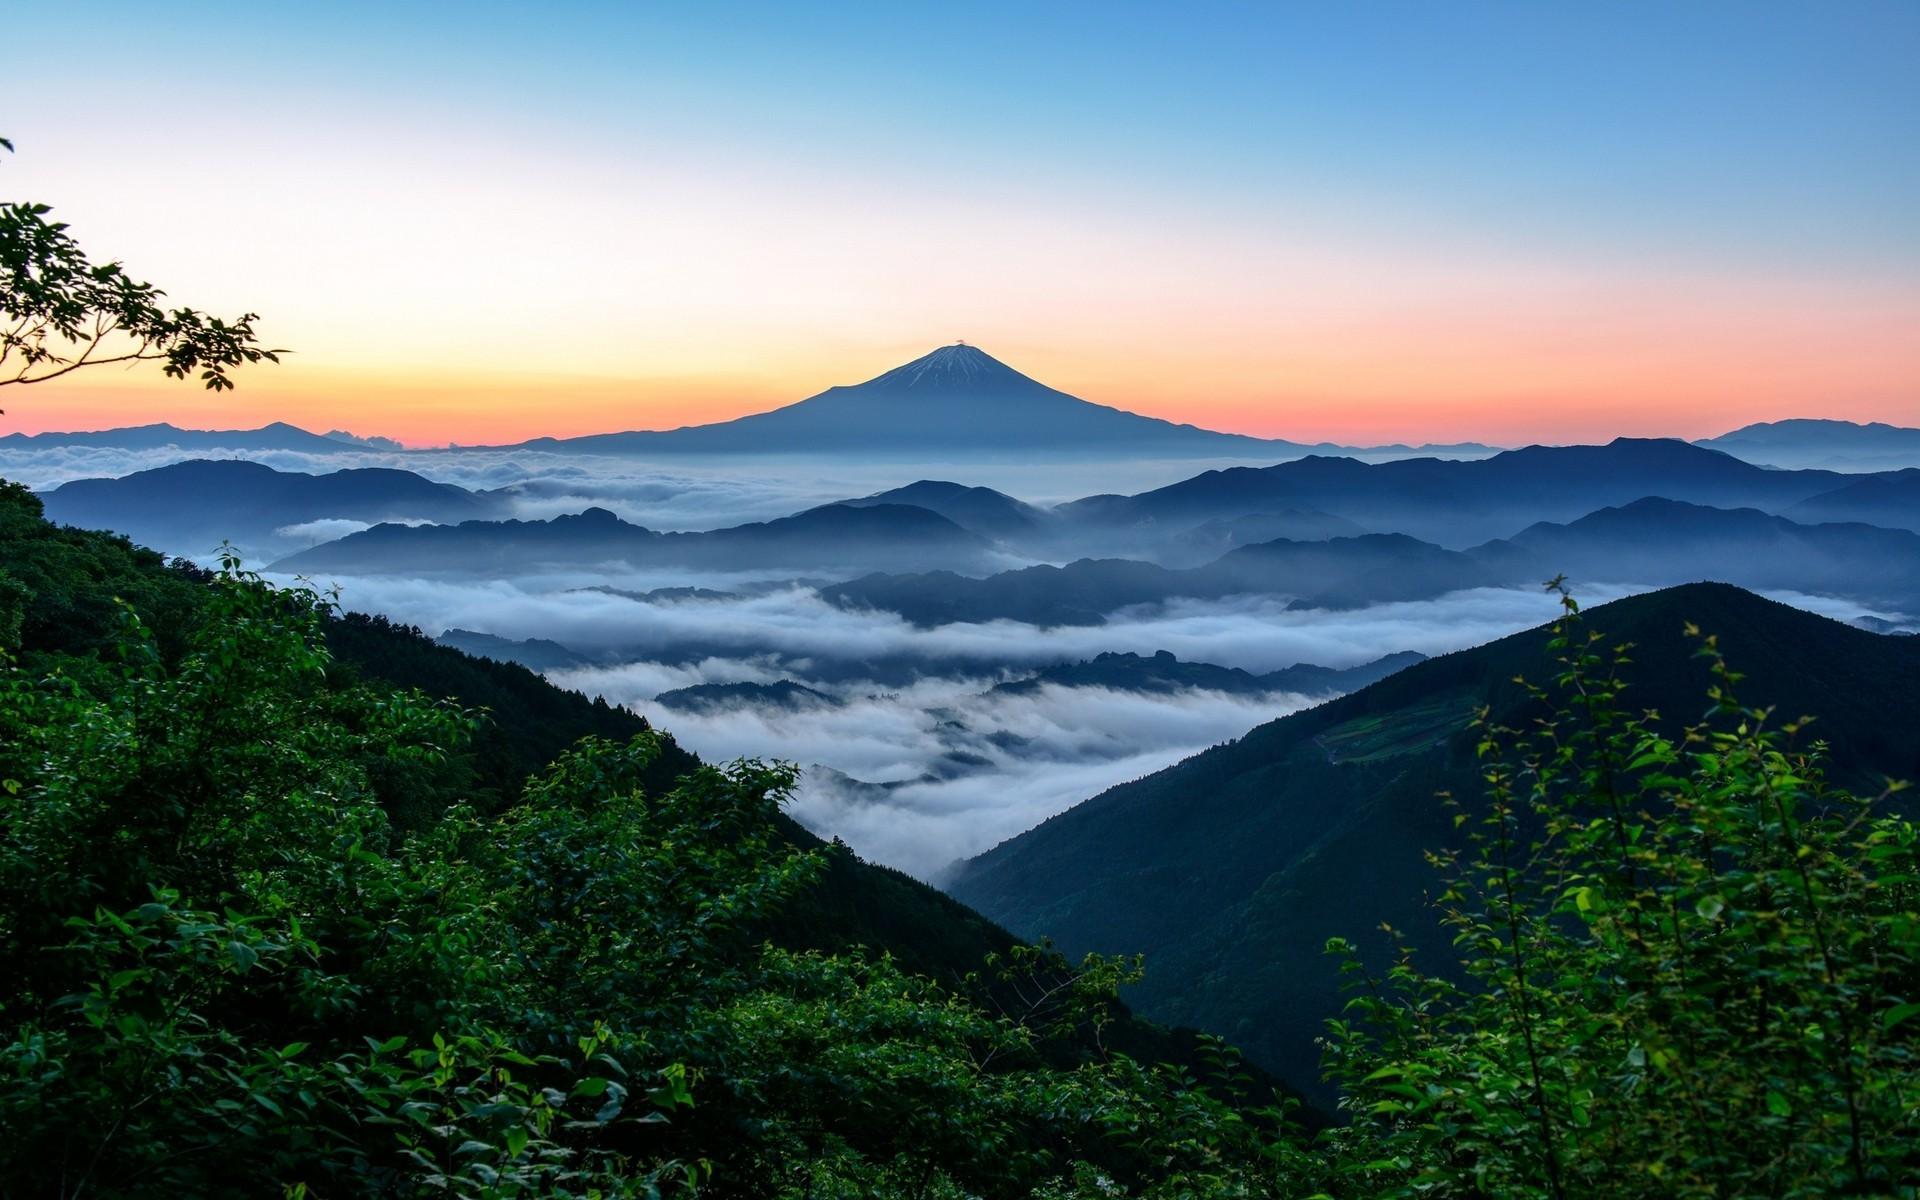 nature, Landscape, Mount Fuji, Japan, Sunrise, Forest, Mountain, Mist  Wallpapers HD / Desktop and Mobile Backgrounds